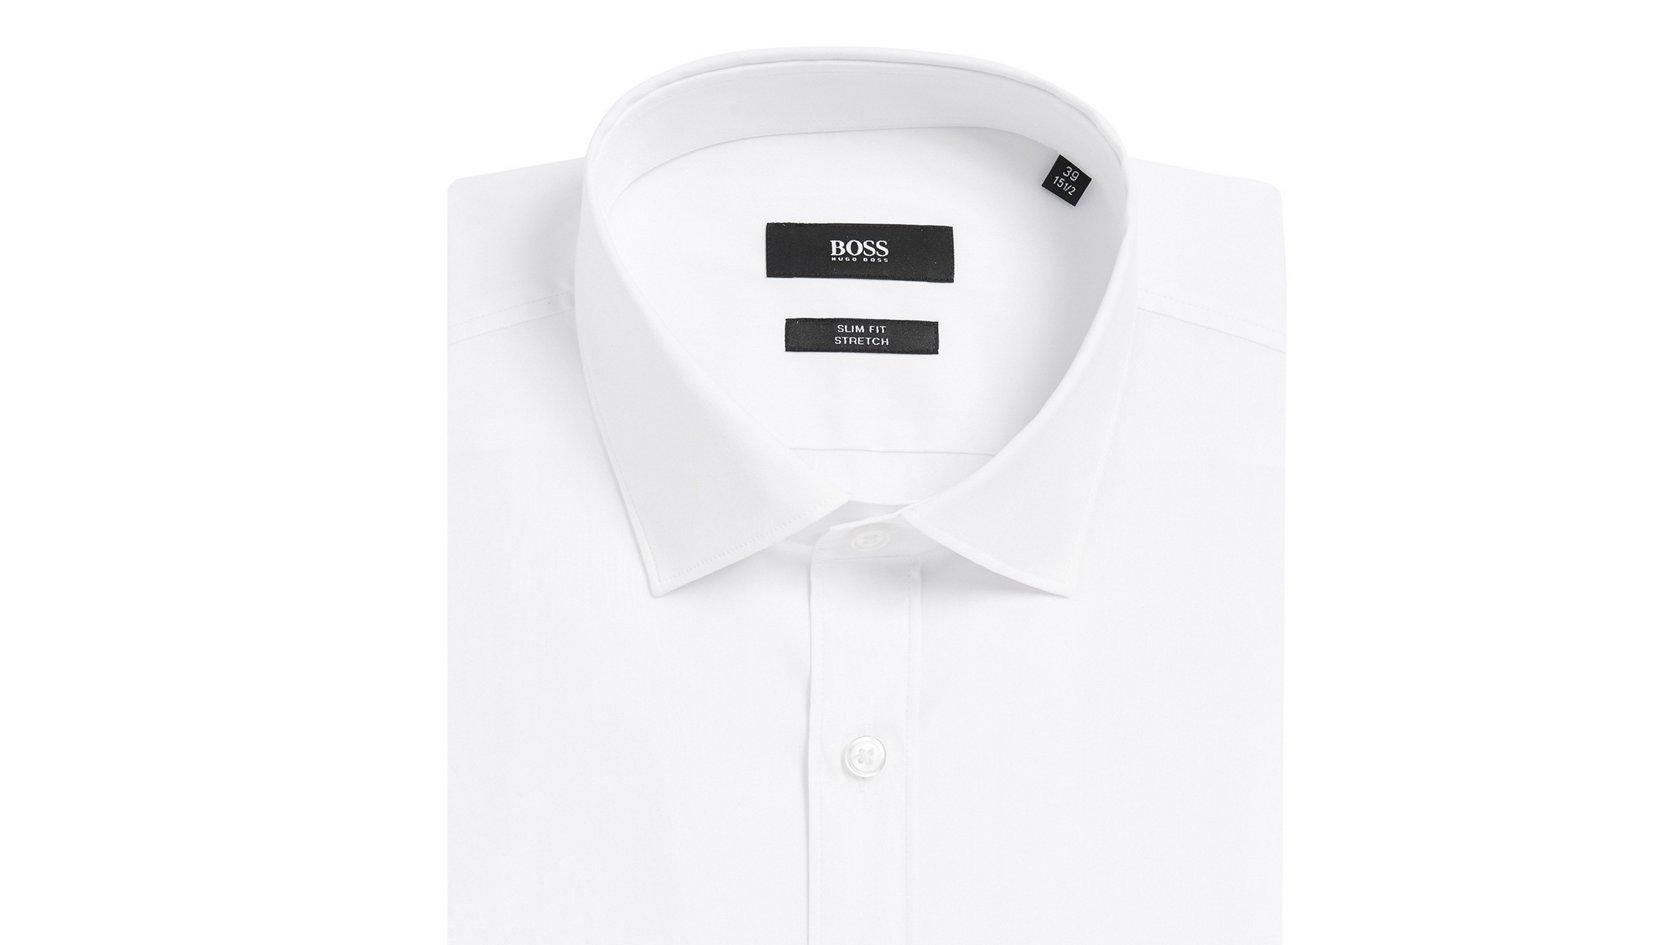 0dfa268c9d24 Ένα λευκό βαμβακερό πουκάμισο δεν γίνεται να σας προδώσει ποτέ. Μπορεί να  φορεθεί τόσο σε επίσημες εκδηλώσεις